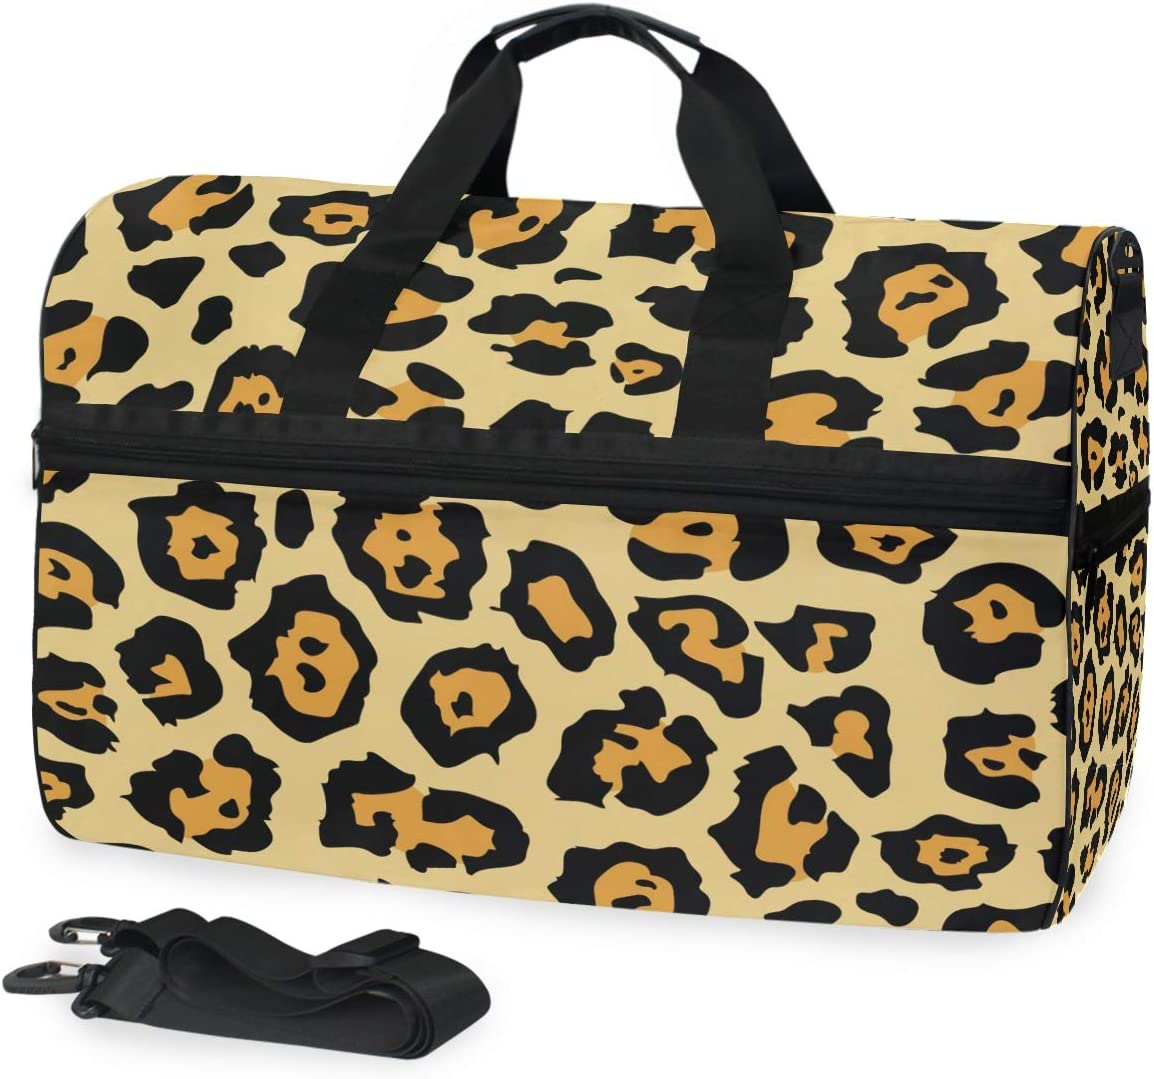 MALPLENA Animal Tiger Painting Packable Duffle Bag For Men Women Tear Resistant Sports Duffle